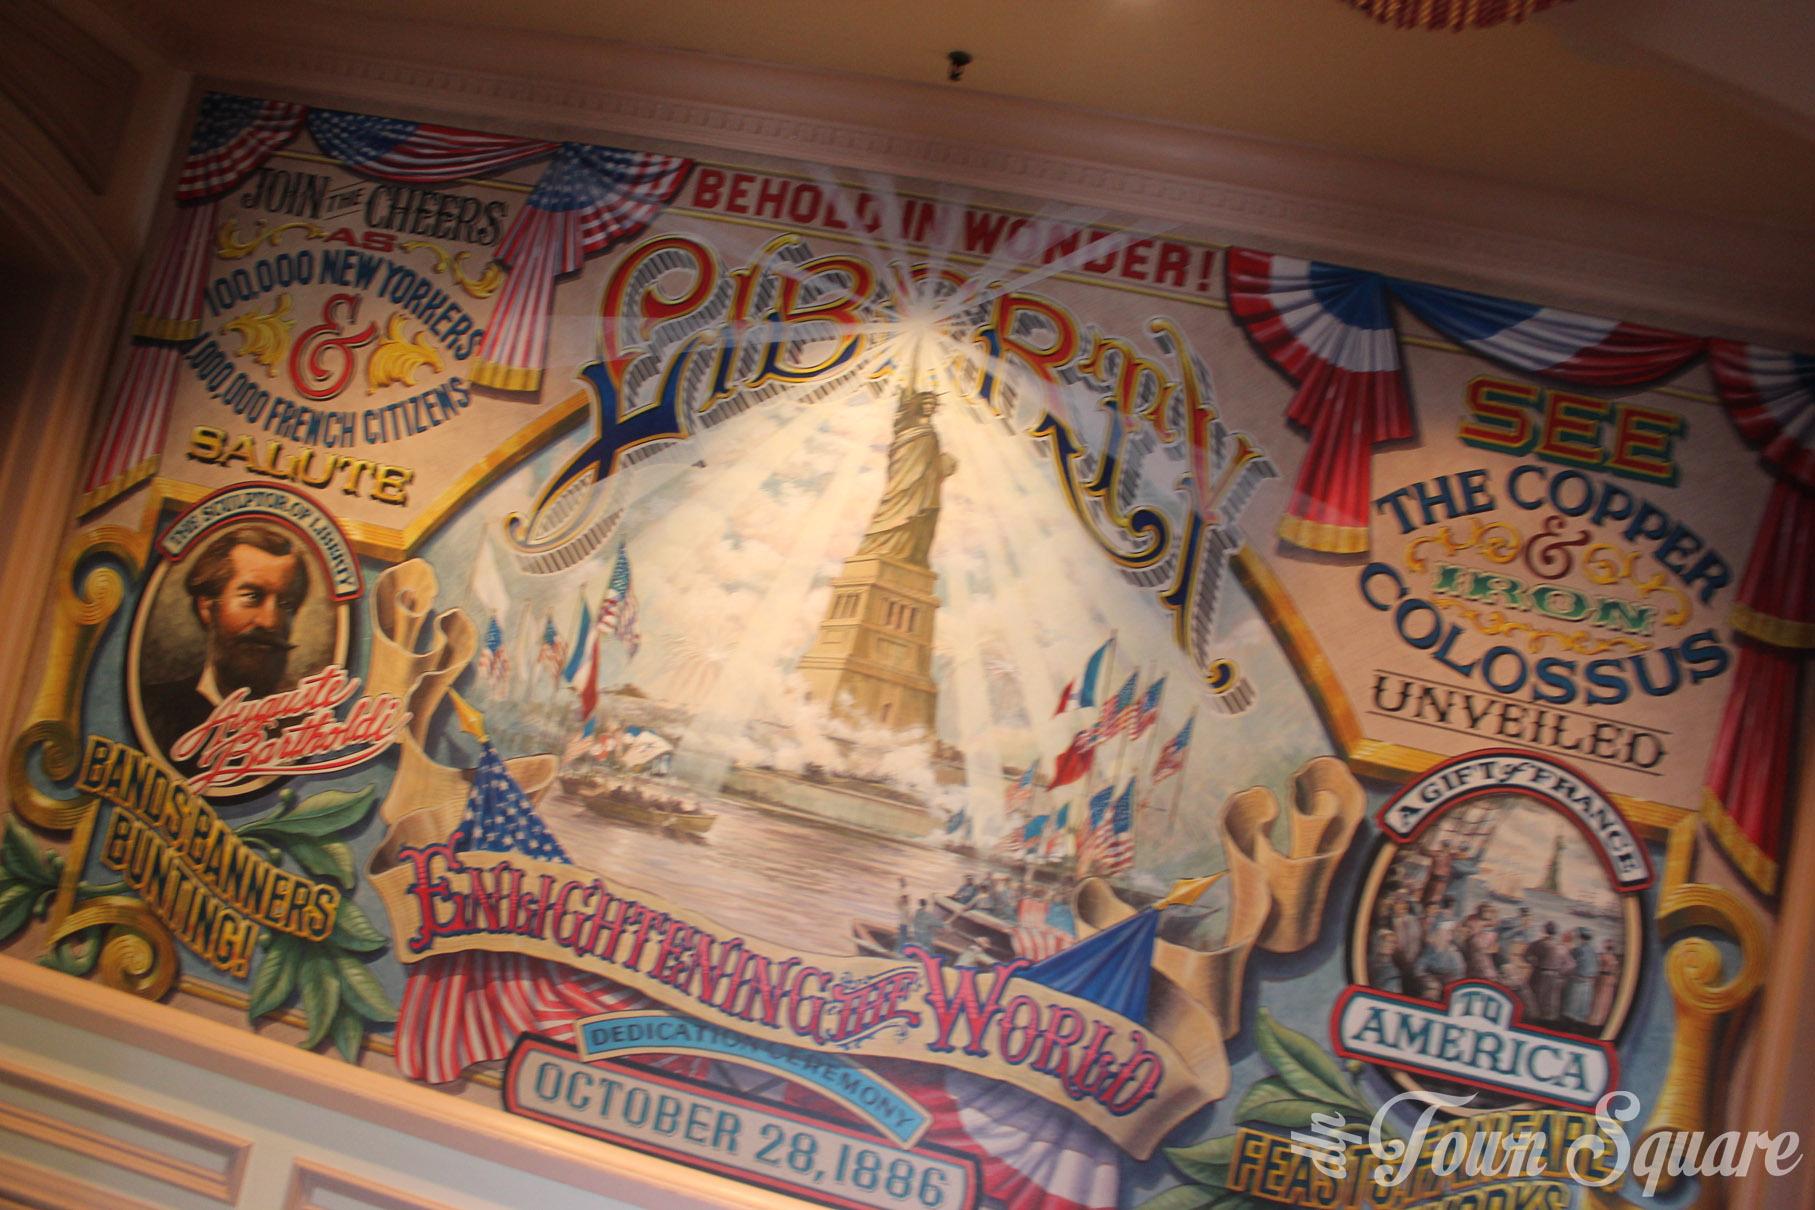 Liberty Arcade Mural